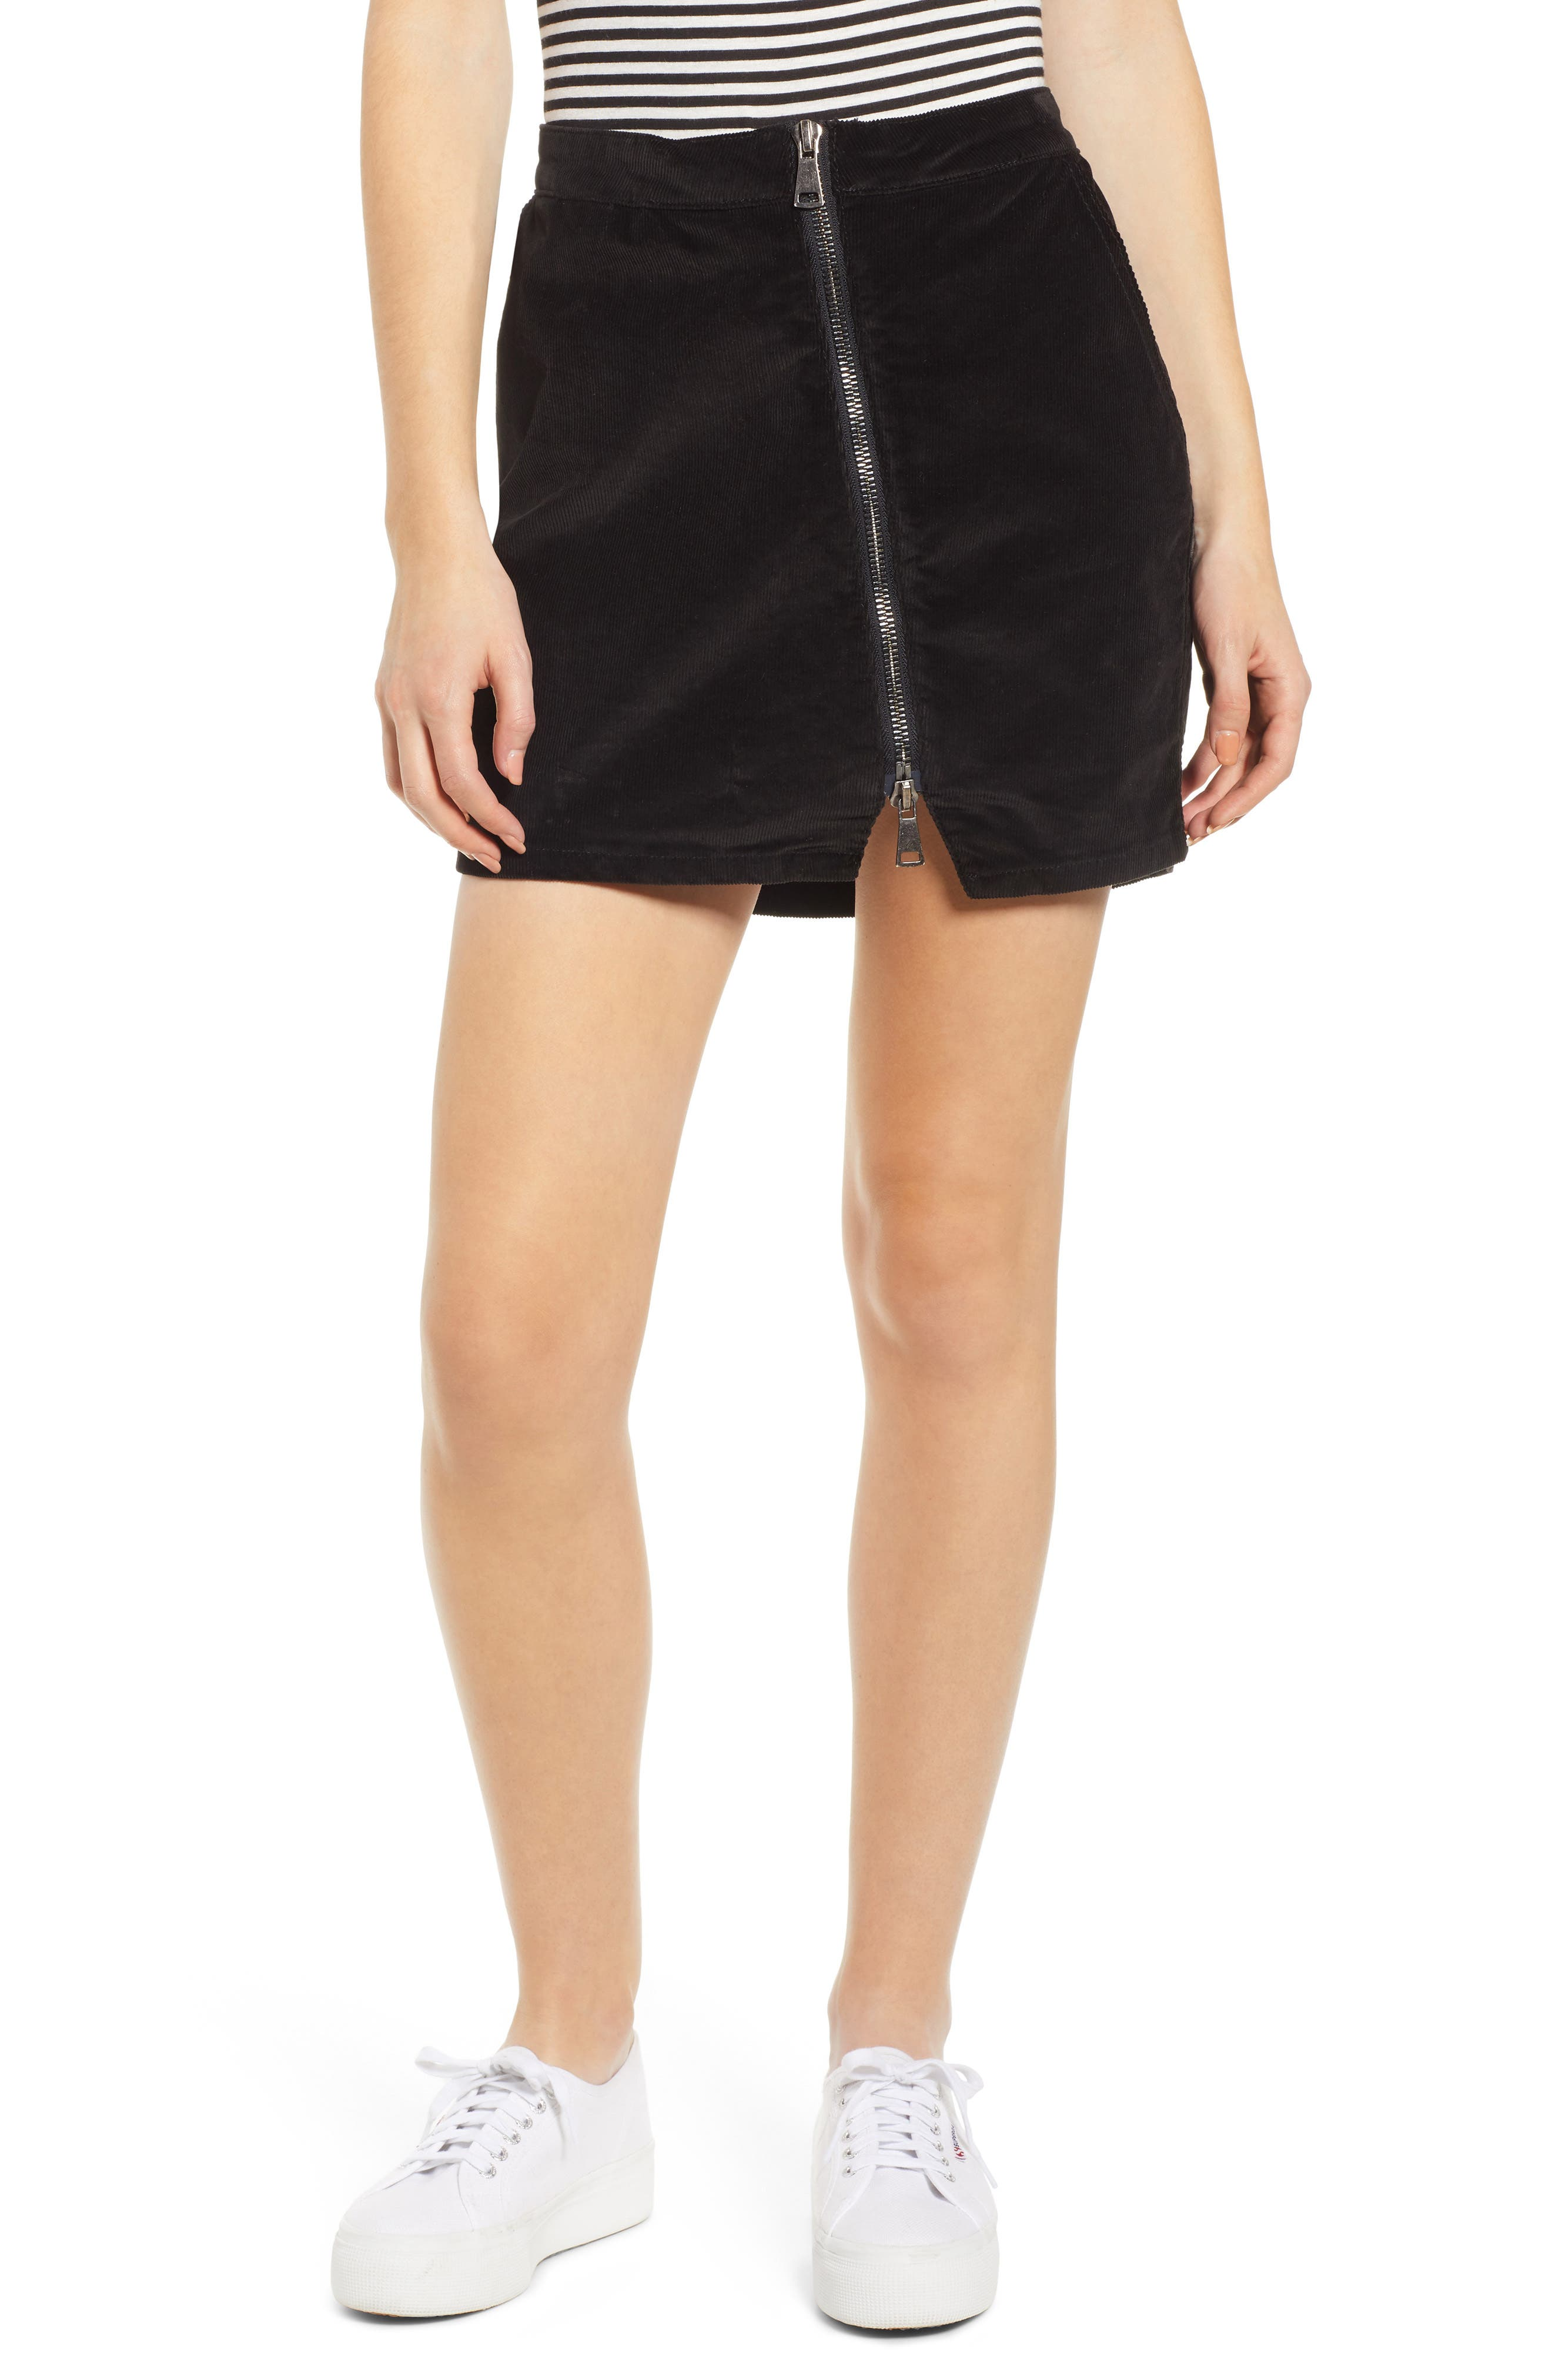 Lira Clothing Javelin Corduroy Miniskirt